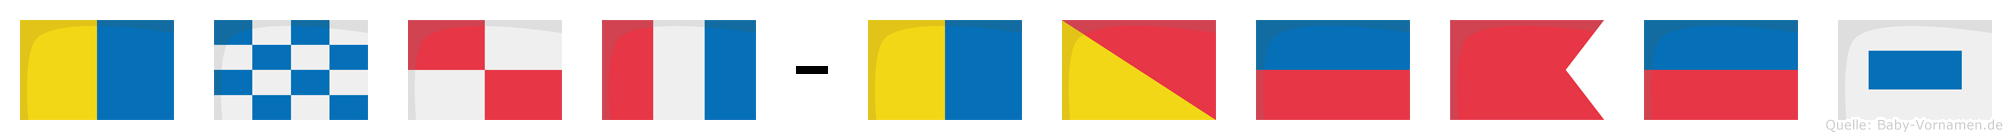 Knut-Köbes im Flaggenalphabet